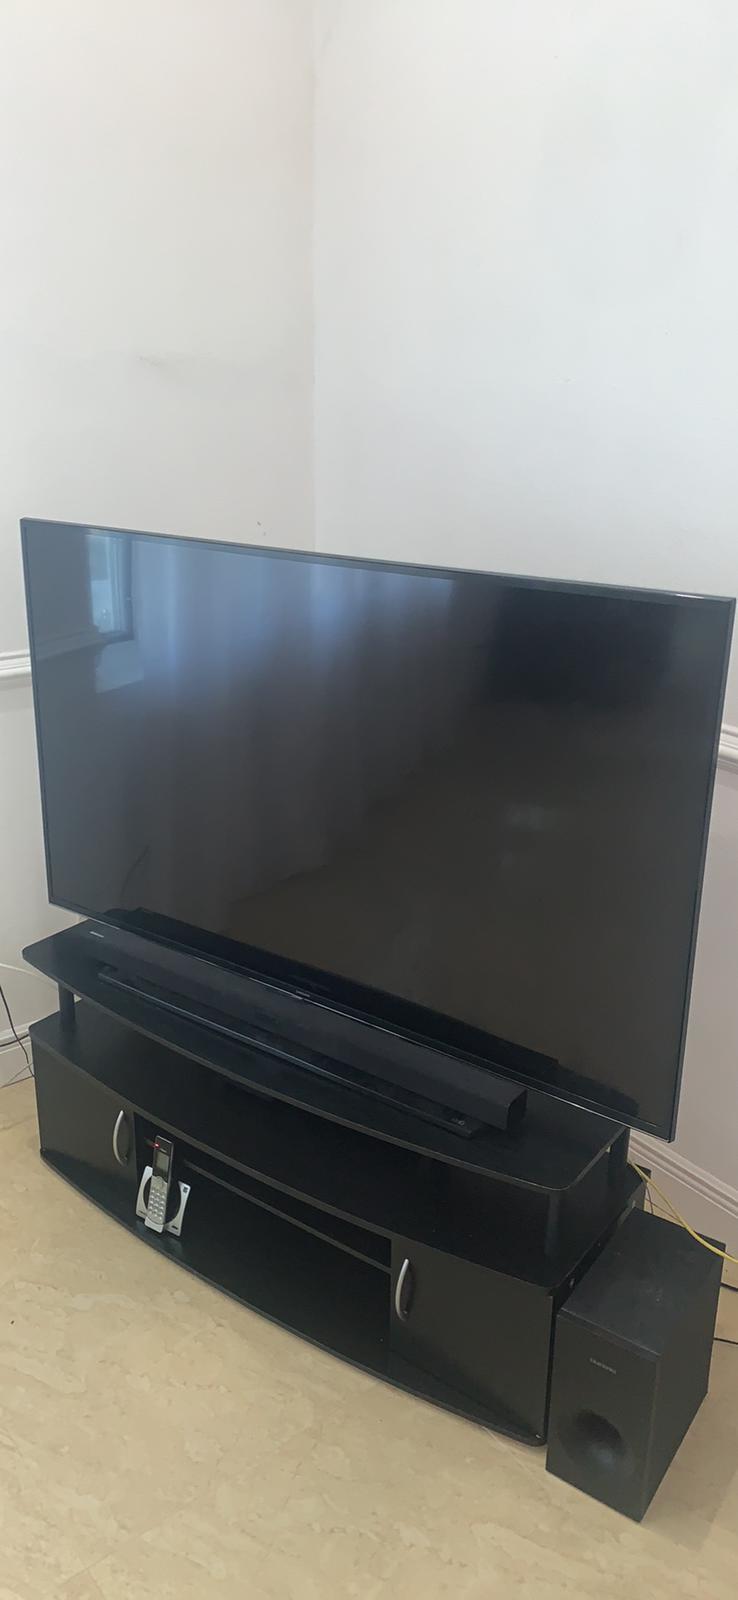 "Samsung - 60"" LED Smart TV - 4K UltraHD"